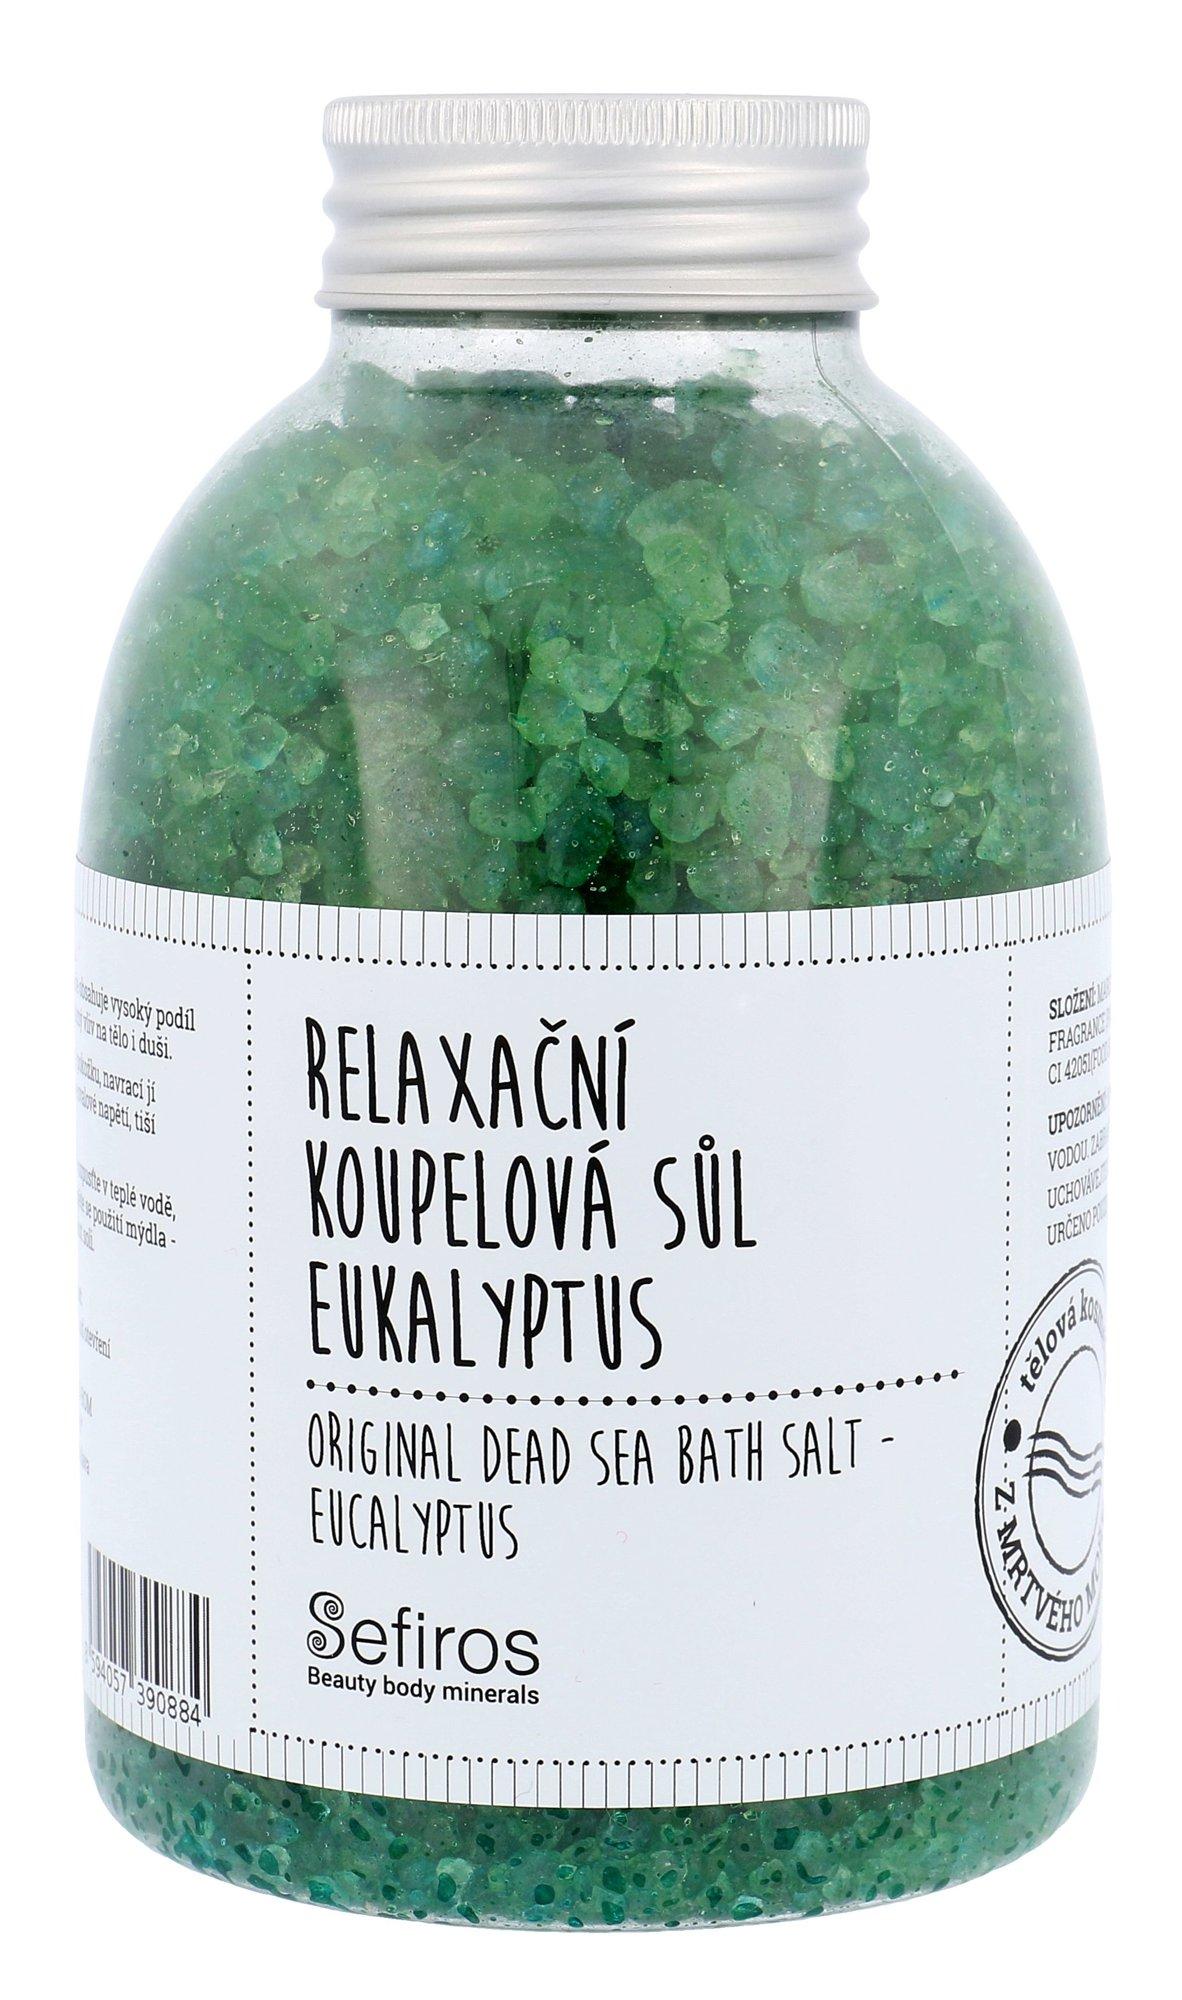 Sefiros Original Dead Sea Bath Salt Eucalyptus Cosmetic 500g